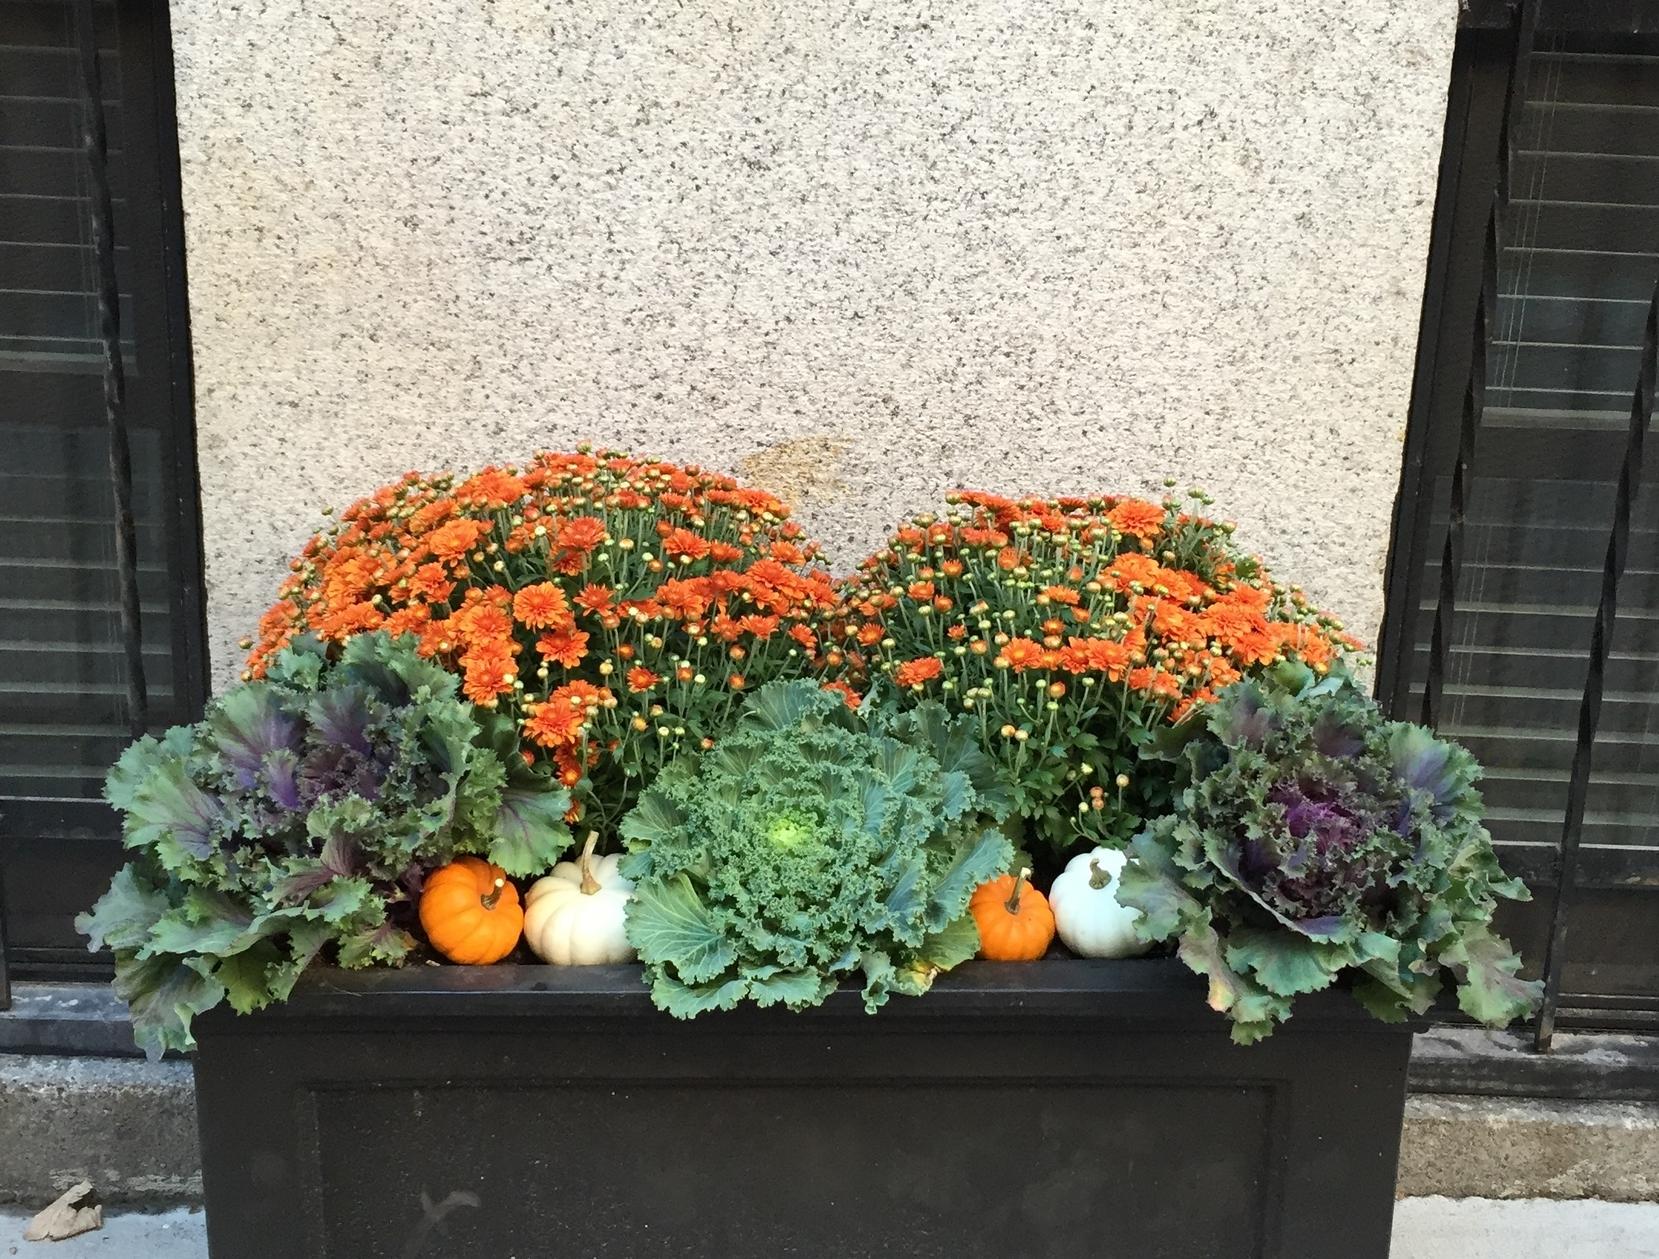 Fairfield patio planter, $190,  Wayfair .